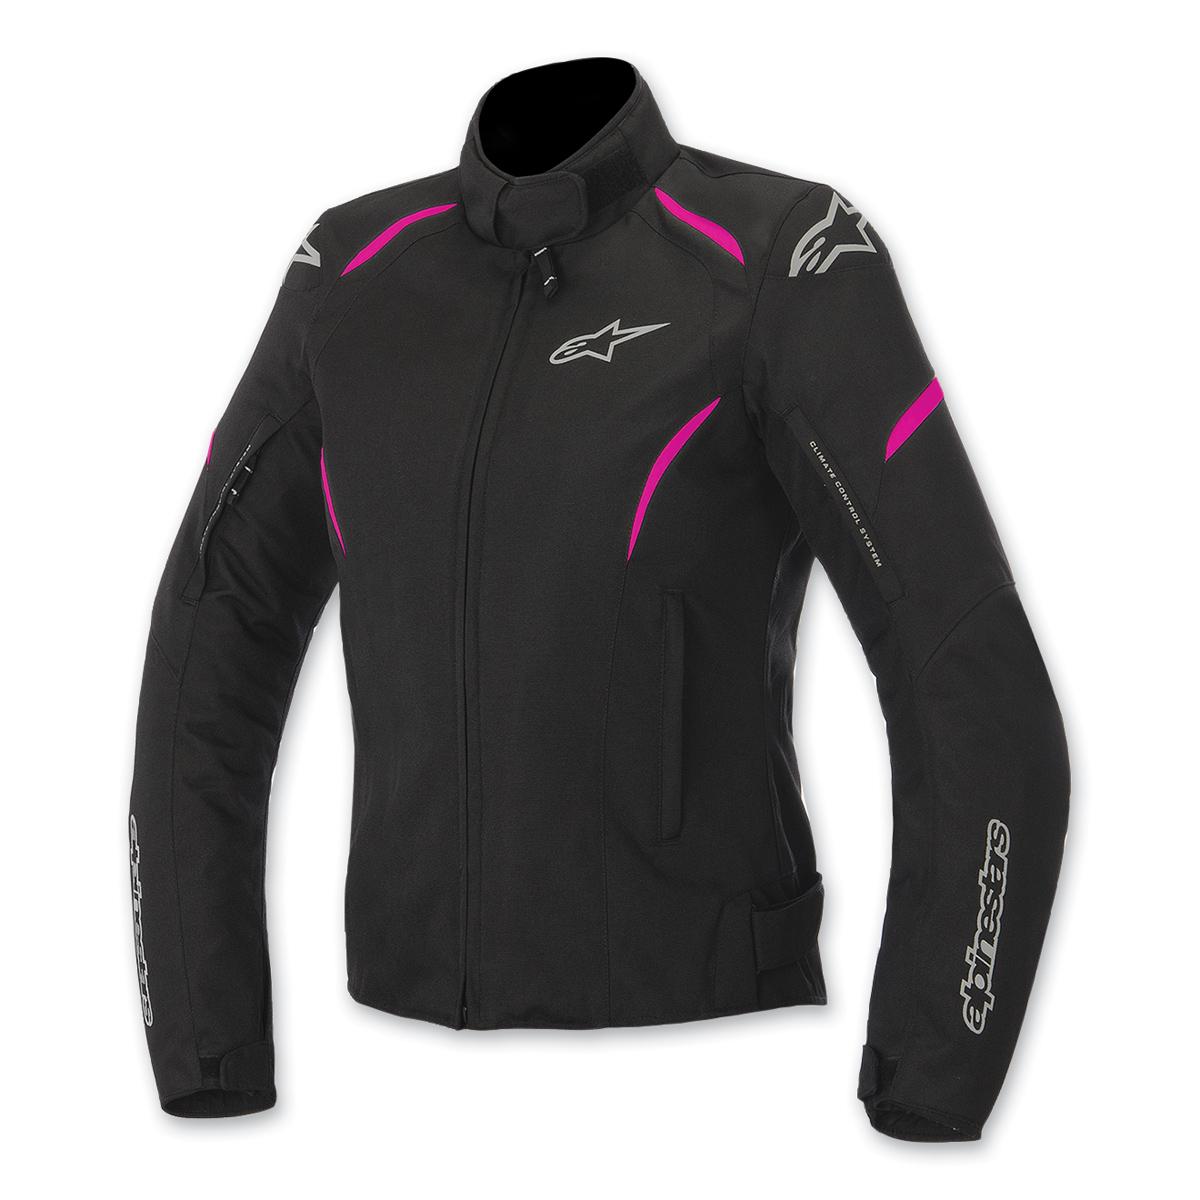 Alpinestars Women's Stella Gunner Waterproof Black/Fuchsia Jacket